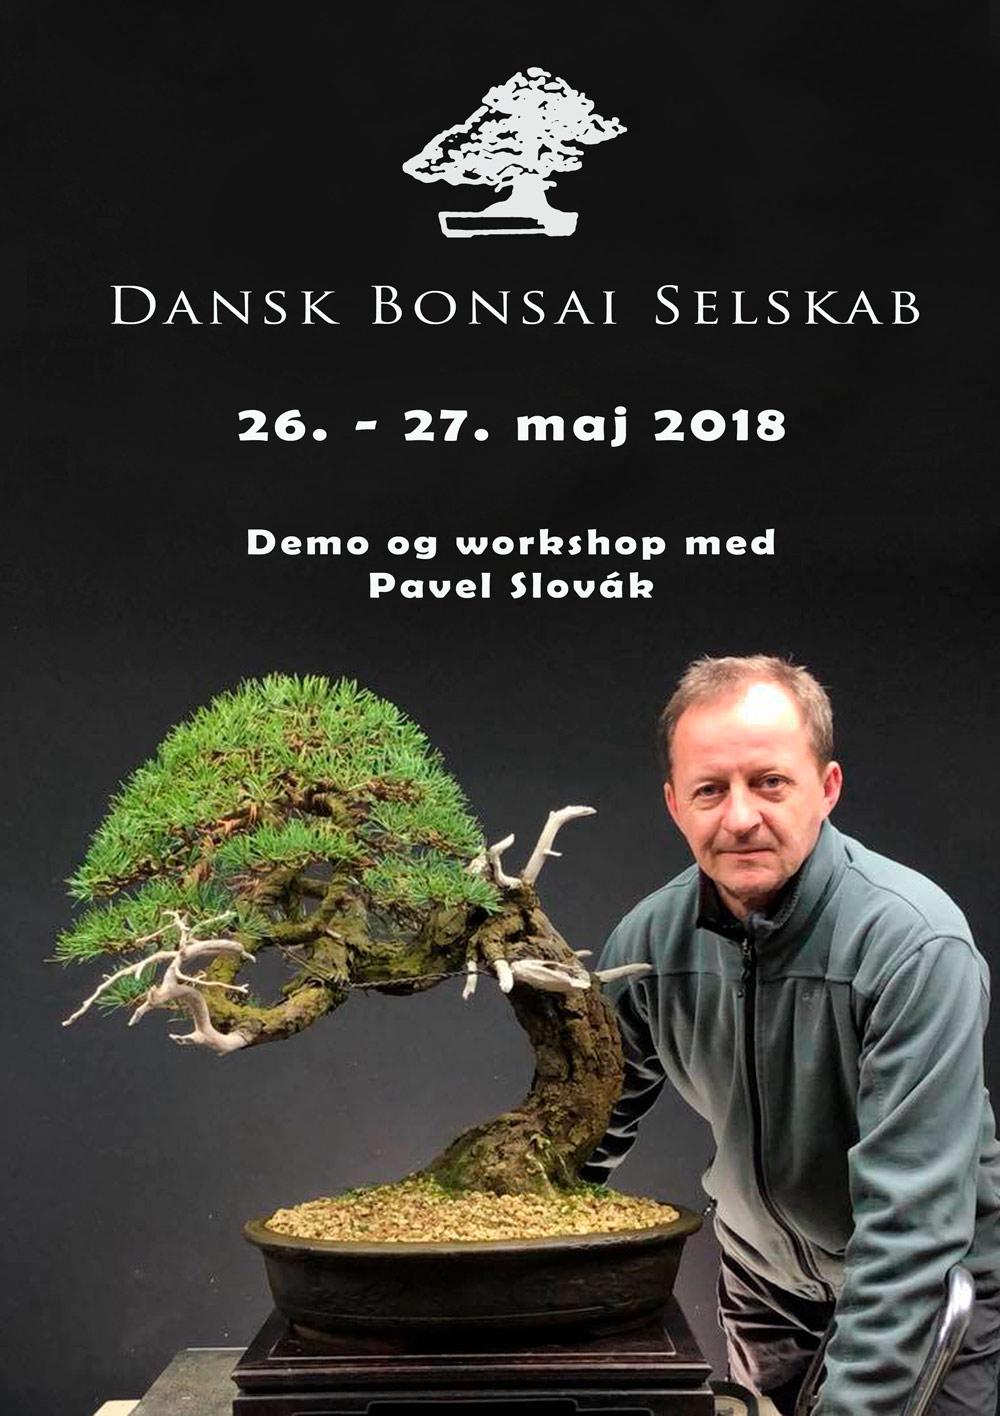 DBS-plakat-2018